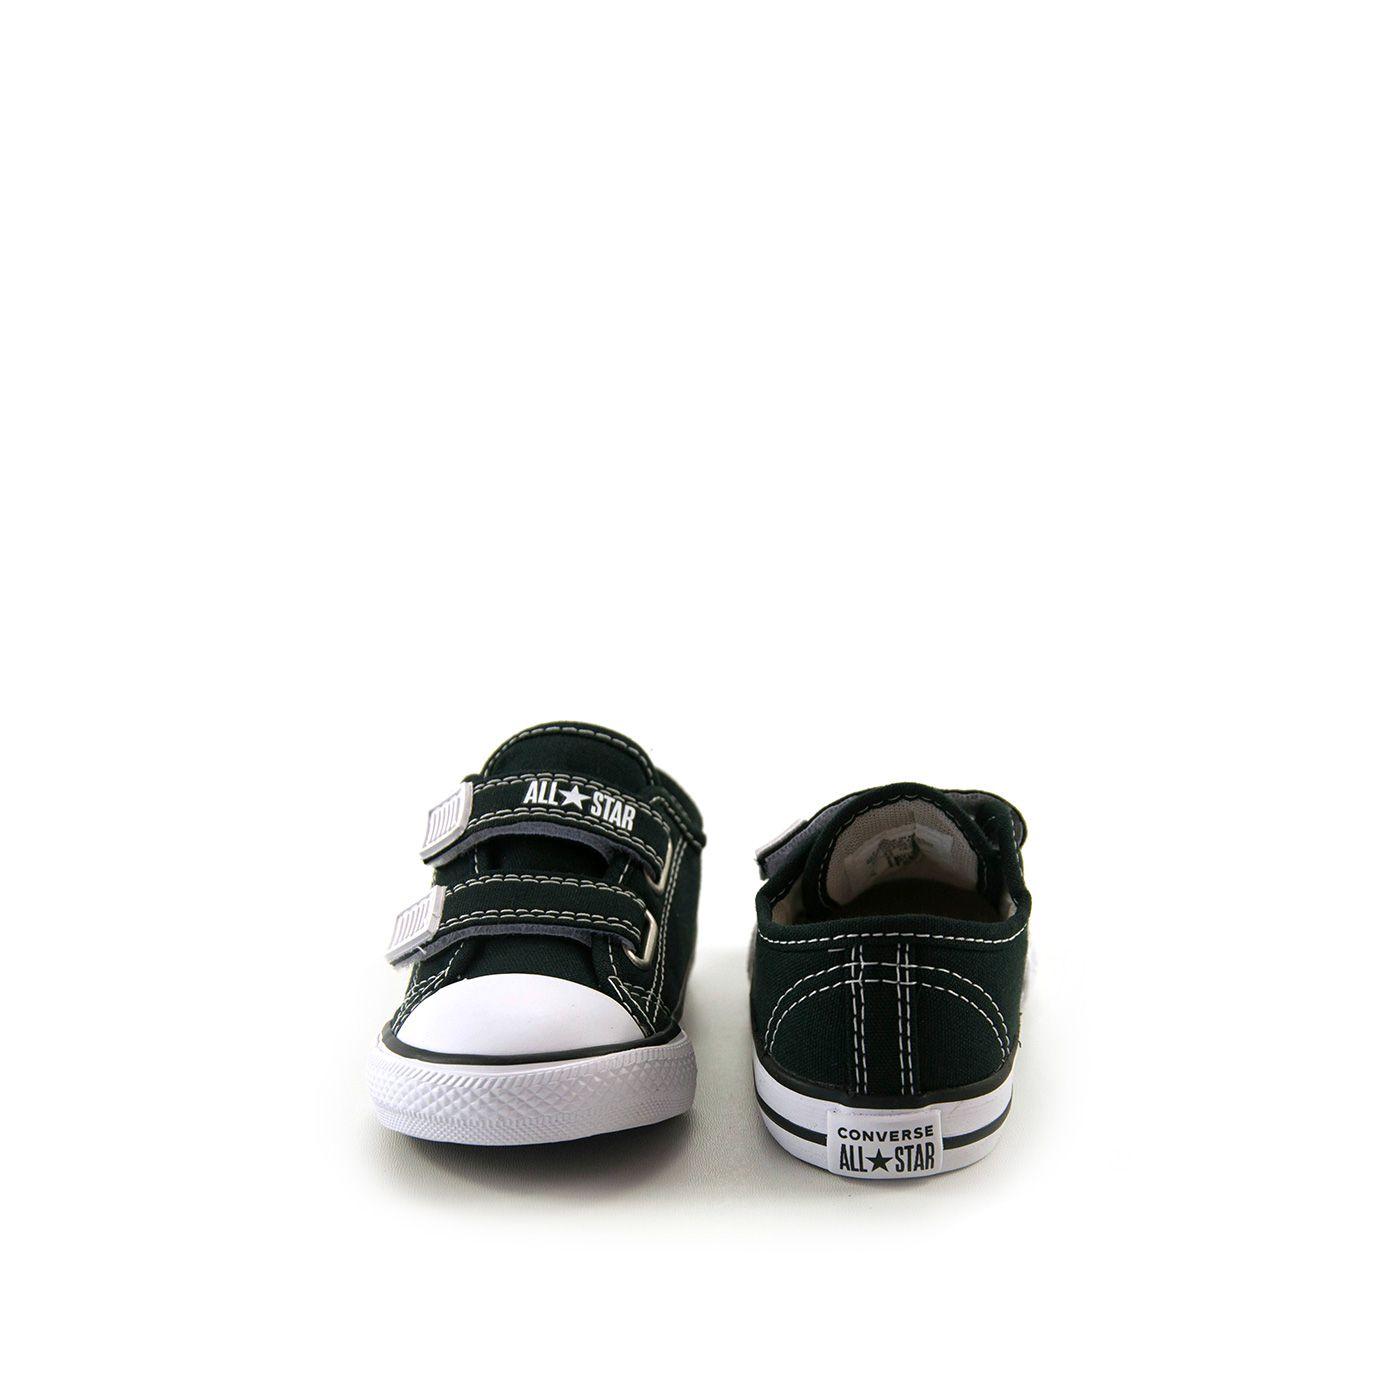 TENIS ALL STAR CONVERSE VELCRO BABY INFANTIL - CK0508